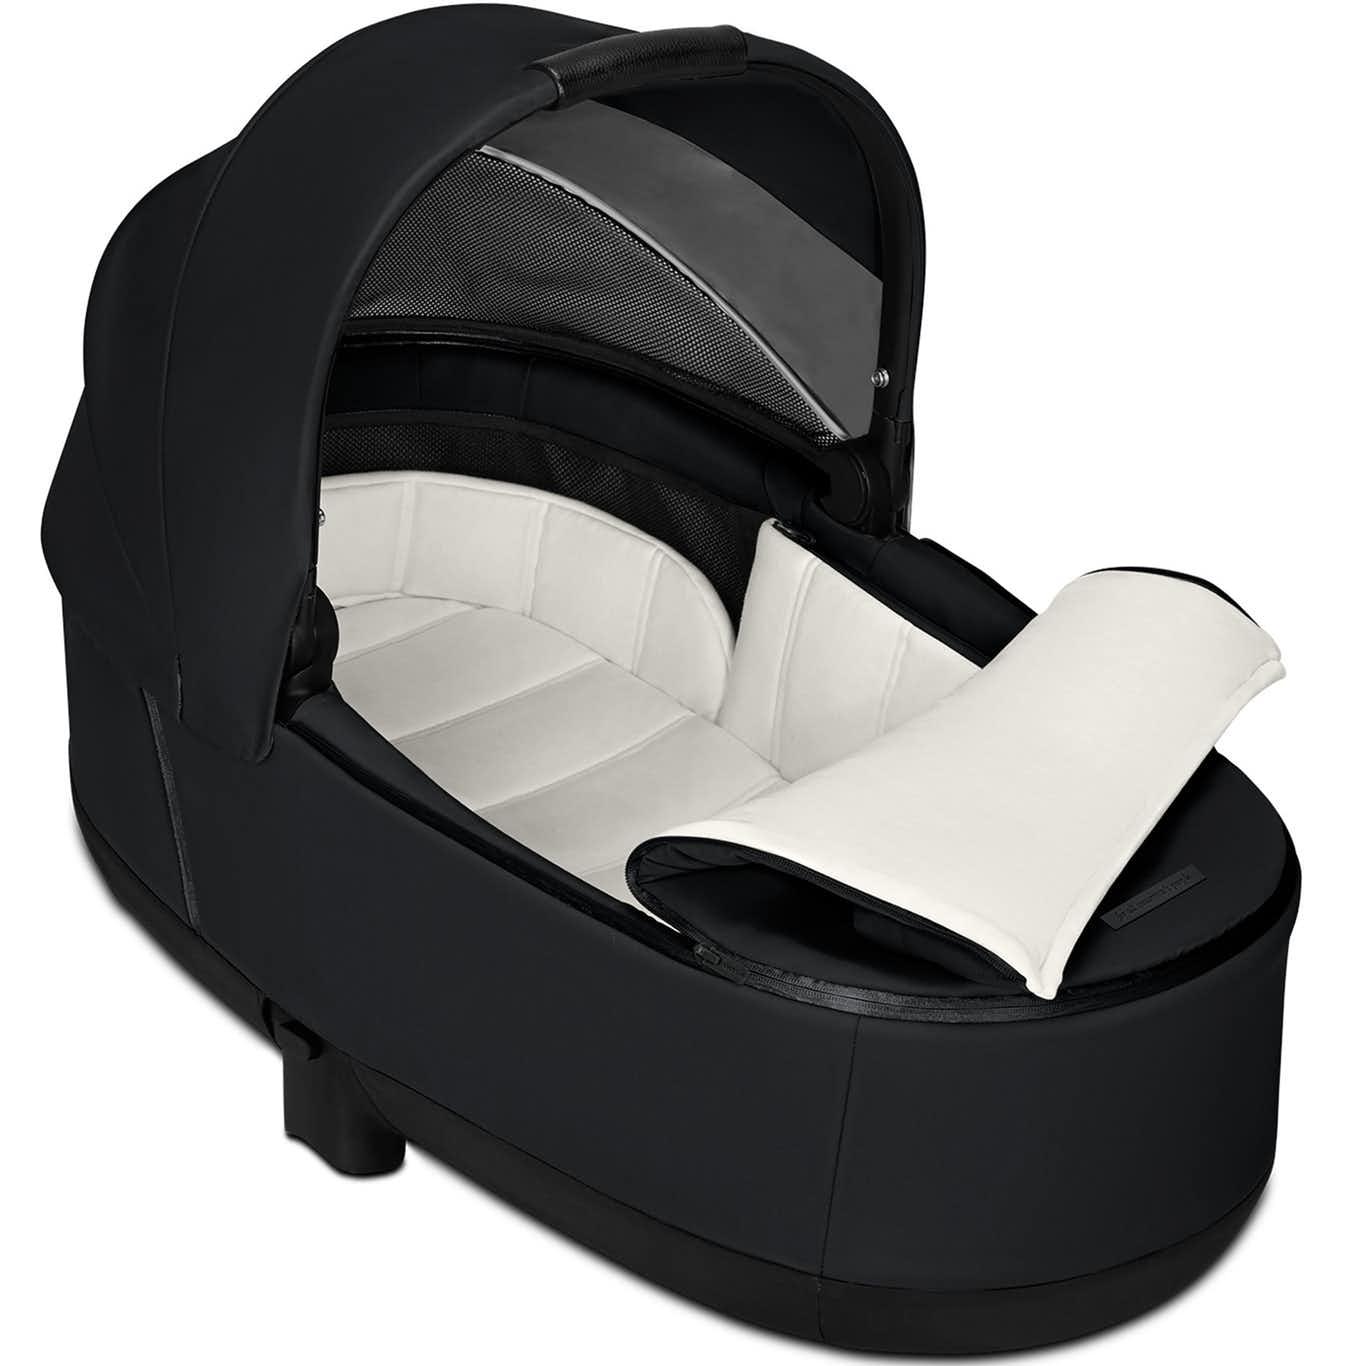 The Baby Room Cybex Priam Carrycot Lux Premium Black 02